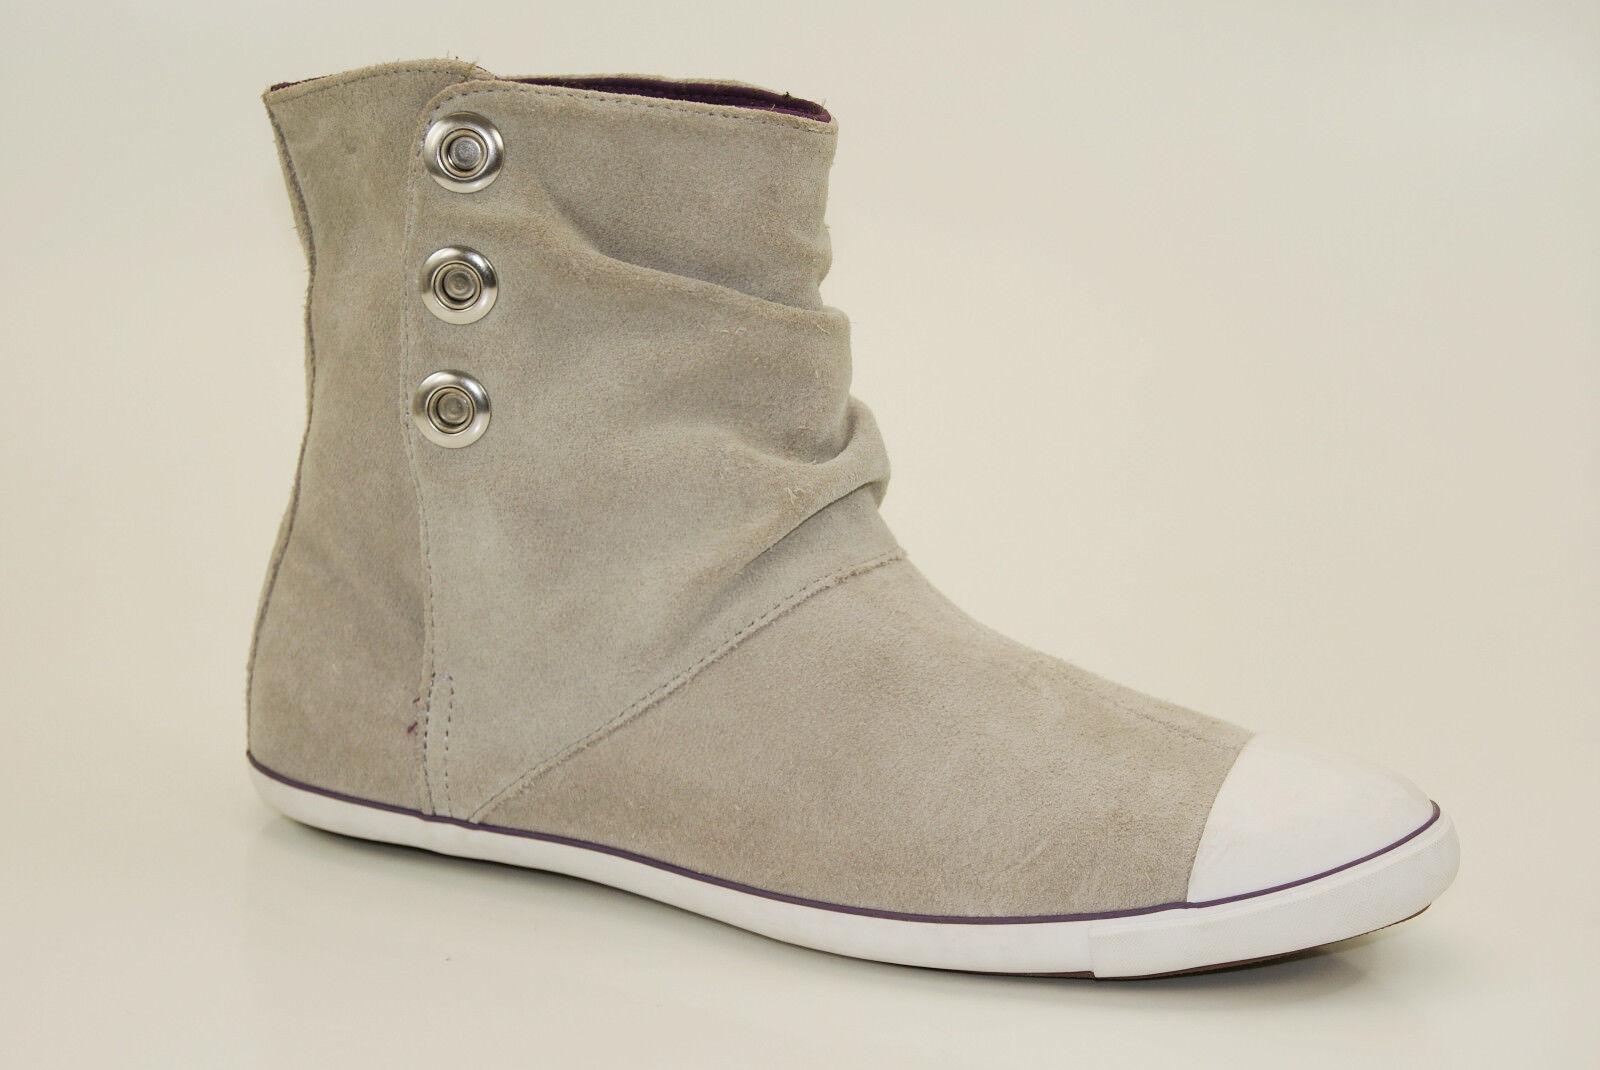 Converse All Star Chucks Light Ankle Boots Gr 37 US 6 Sneakers Damen 511217